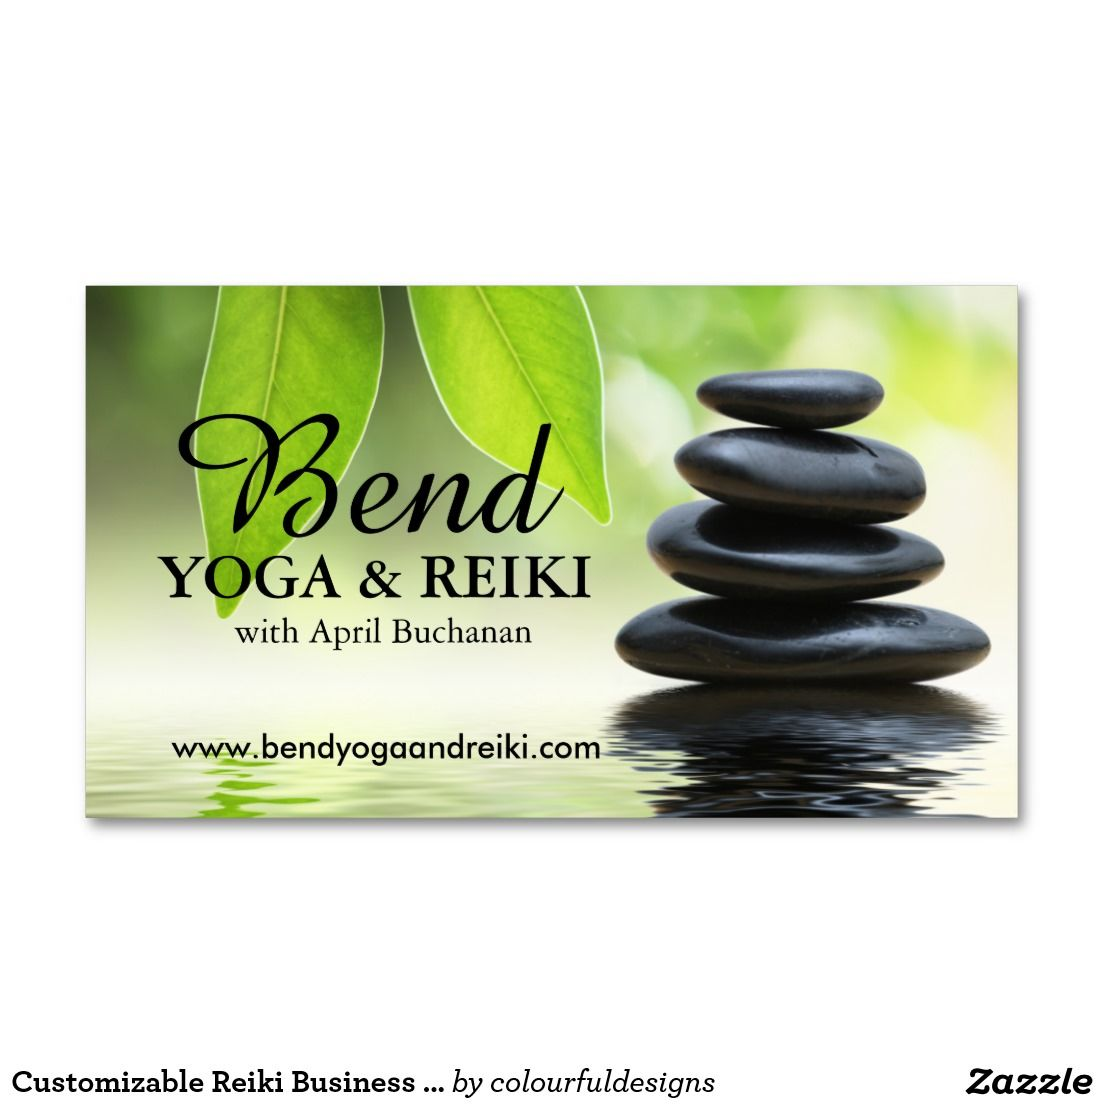 Customizable Reiki Business Cards | Meditation Business Cards ...